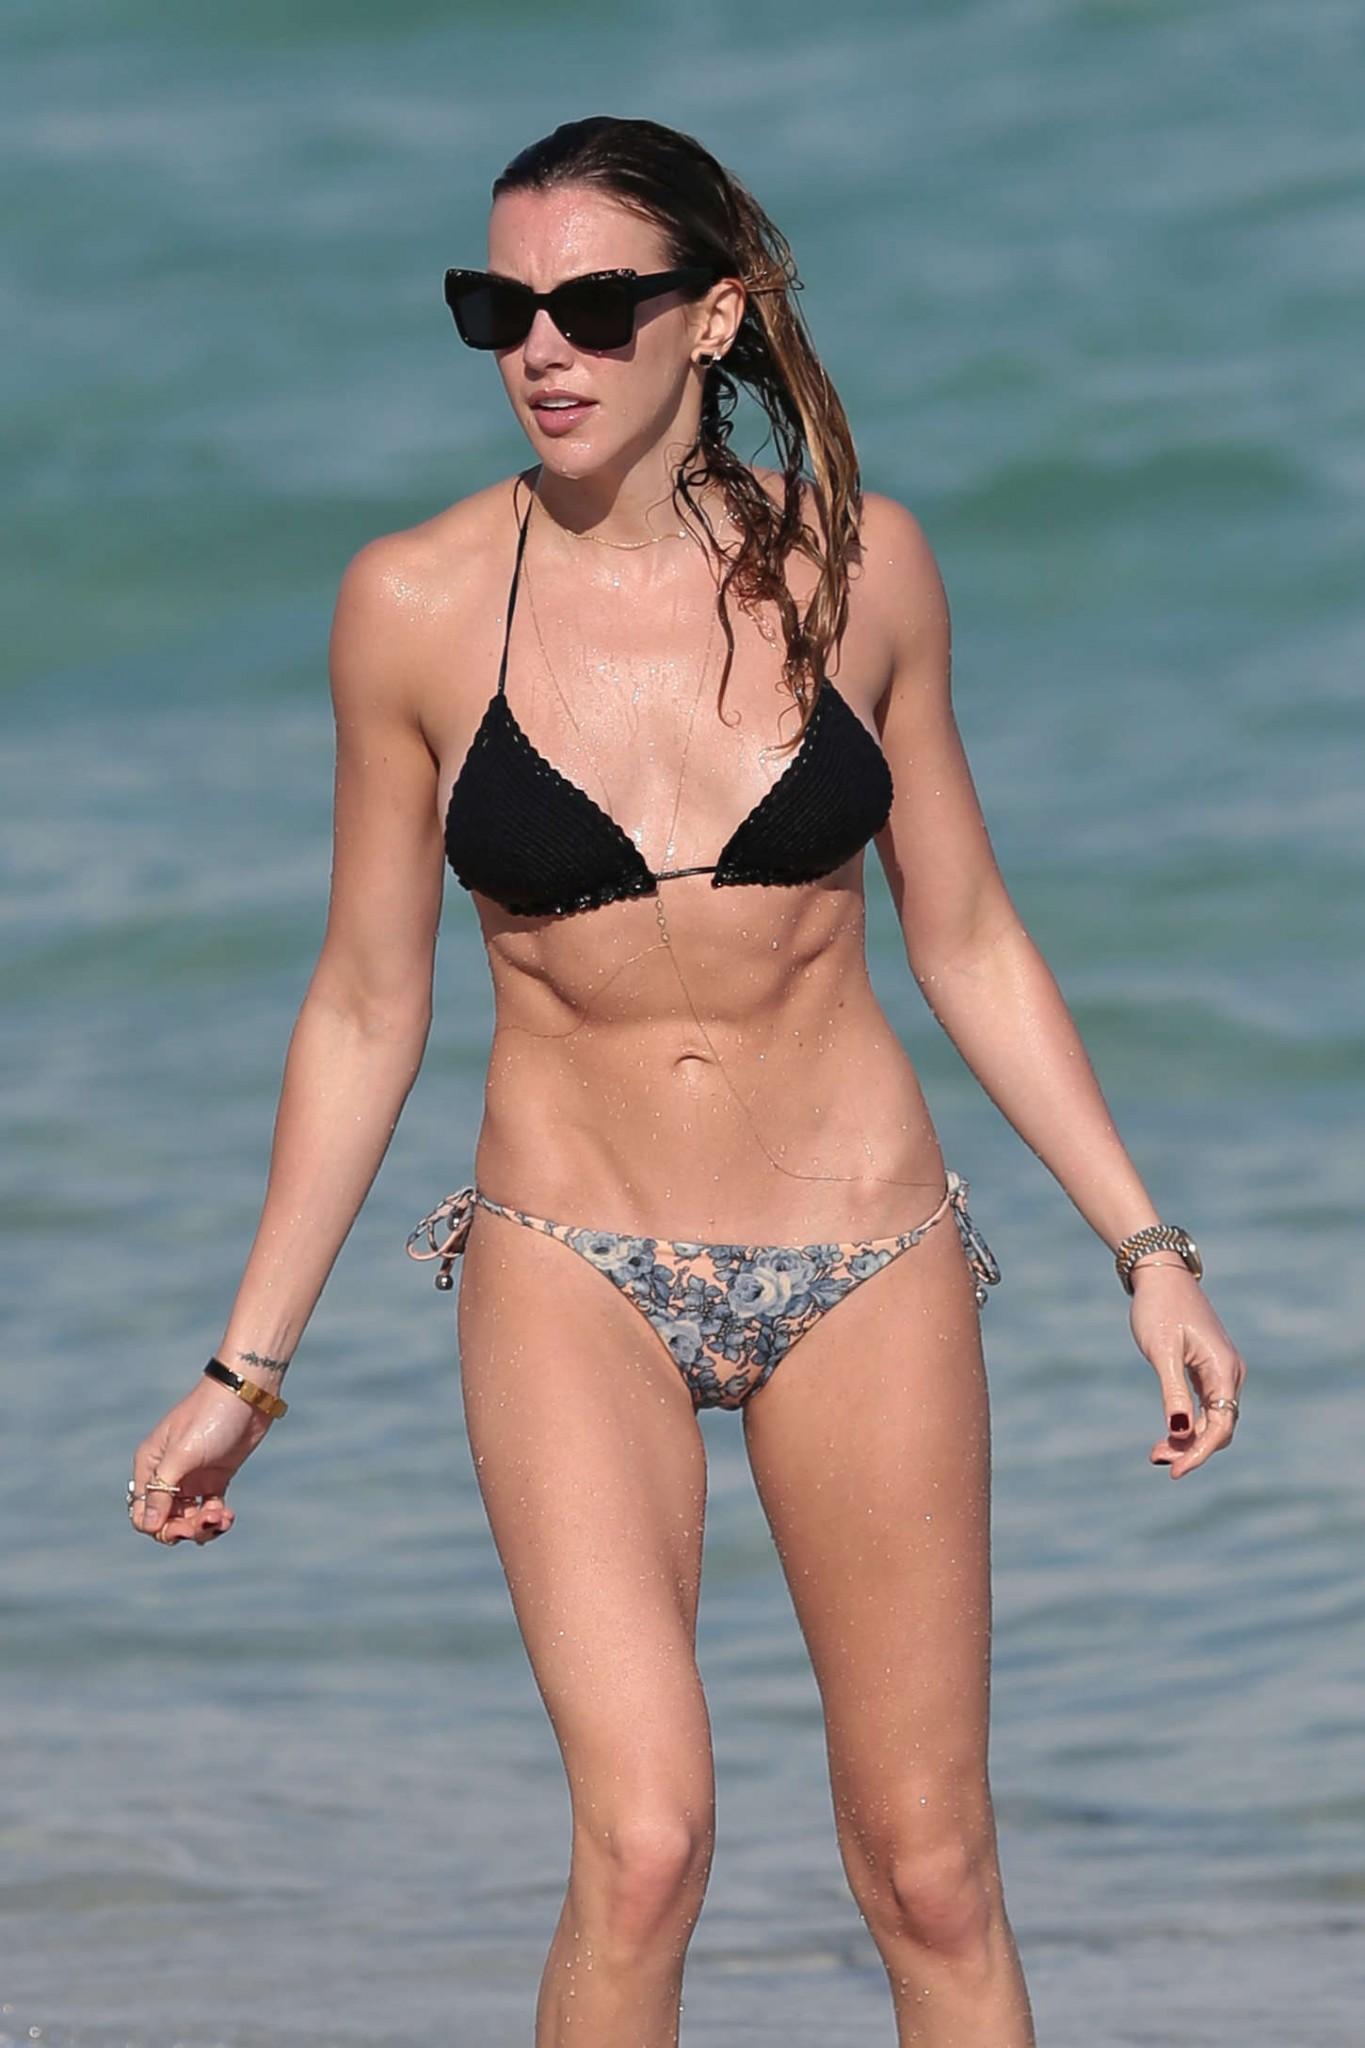 katie-cassidy-in-bikini-at-the-beach-in-miami-8.jpg